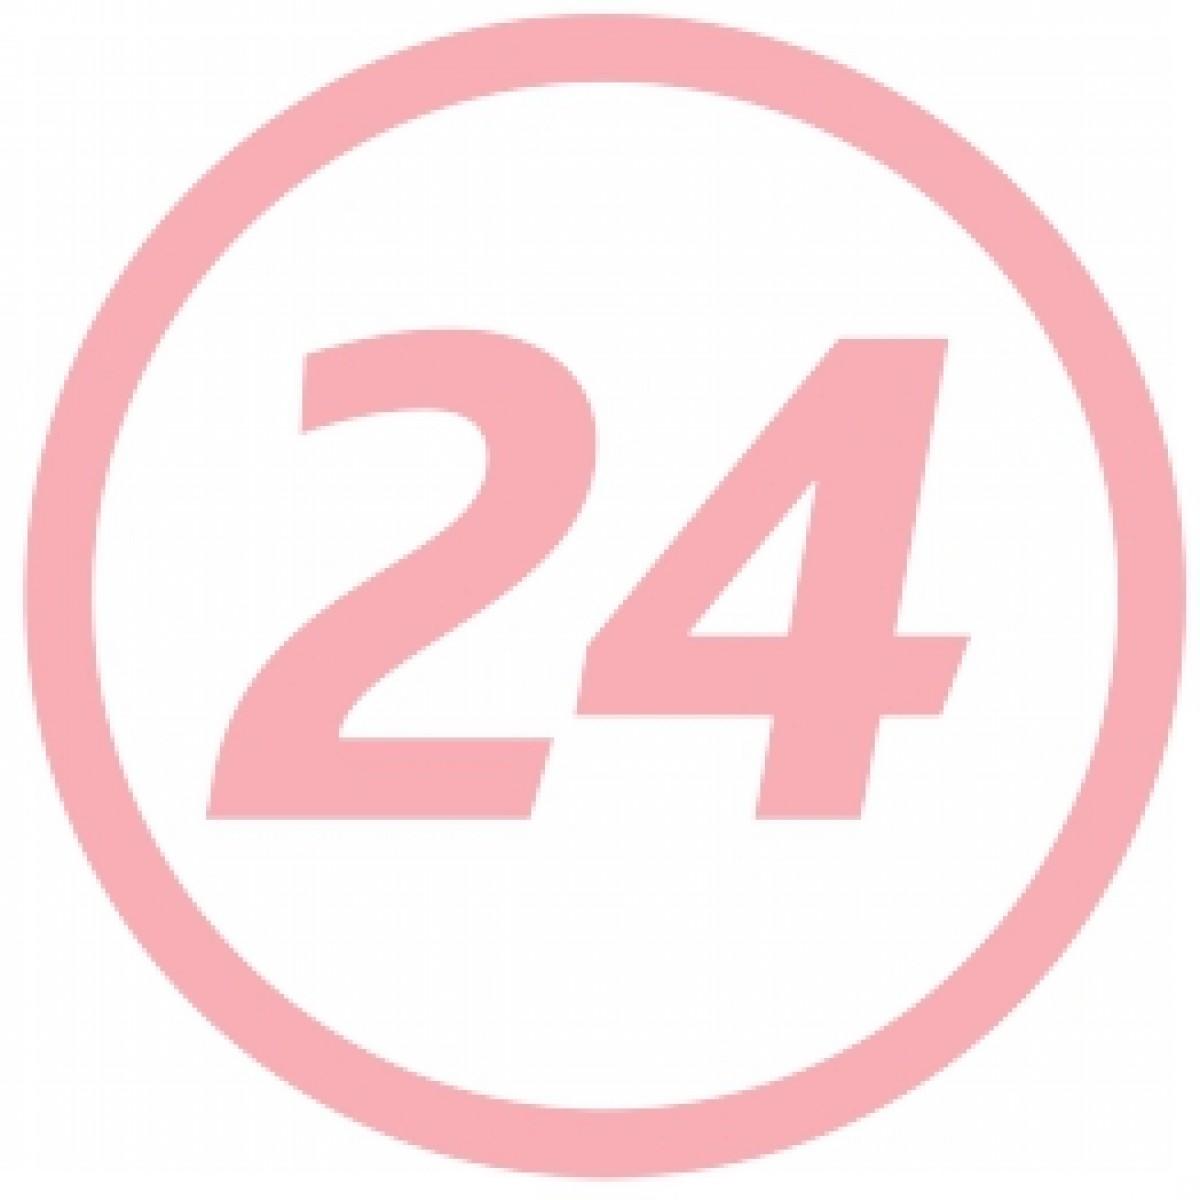 NUK Suzeta Din Silicon Trendline, ADORE, Marimea 2 (6-18 Luni) Fara Inel, Suzeta, 1 buc